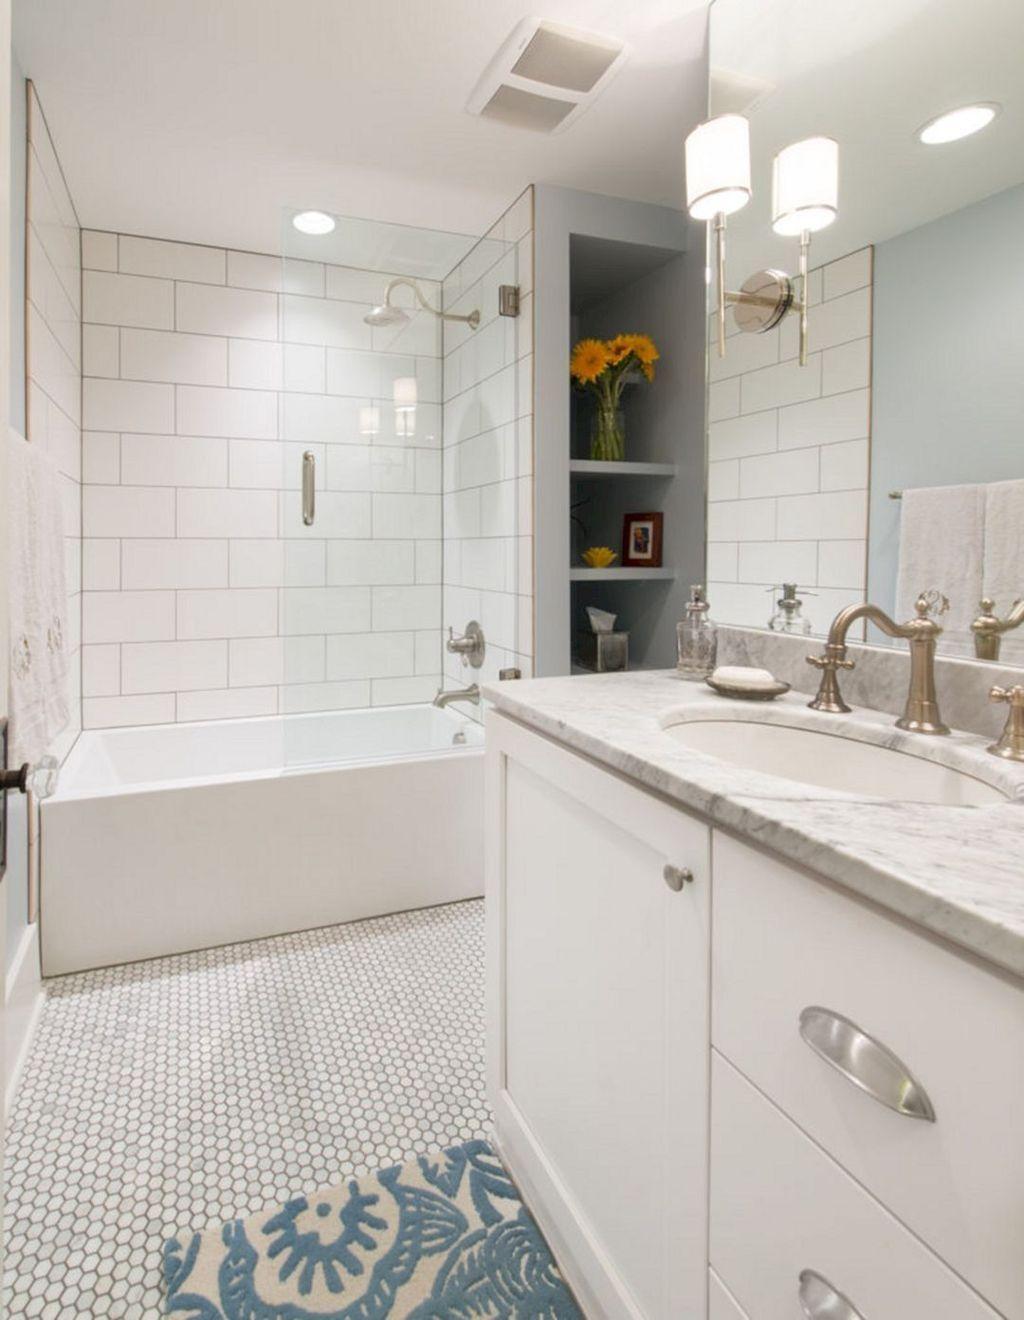 Lovely Bathroom Ceramic Tile Ideas You Should Copy 30